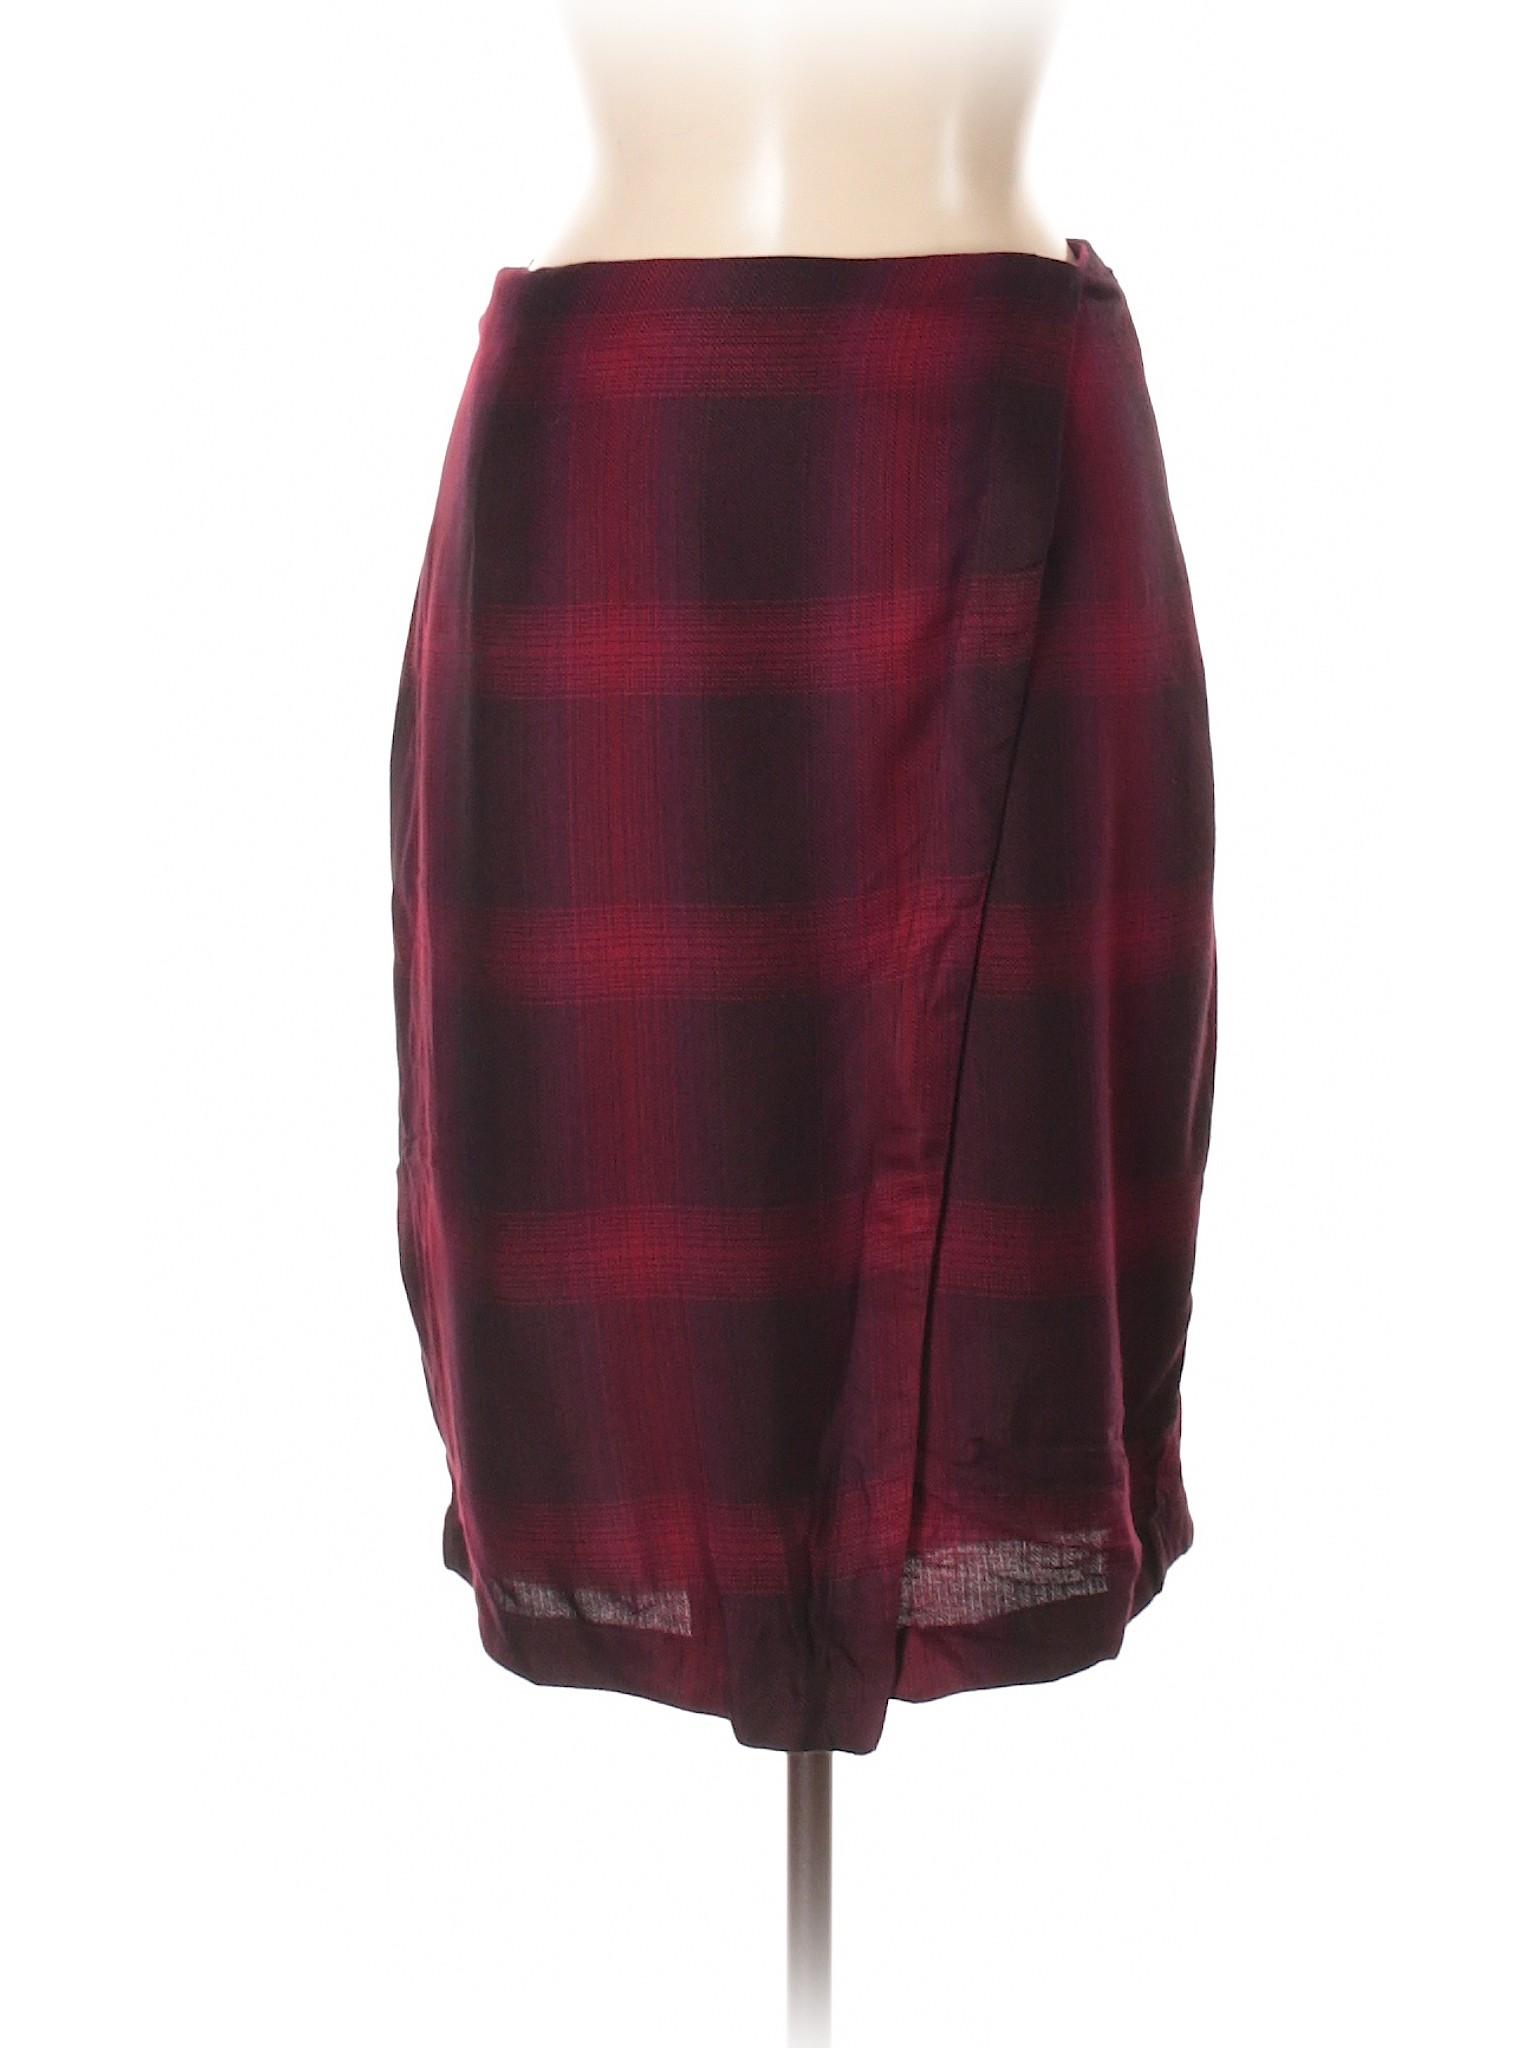 Boutique Casual Skirt Boutique Casual Skirt 1zRvq